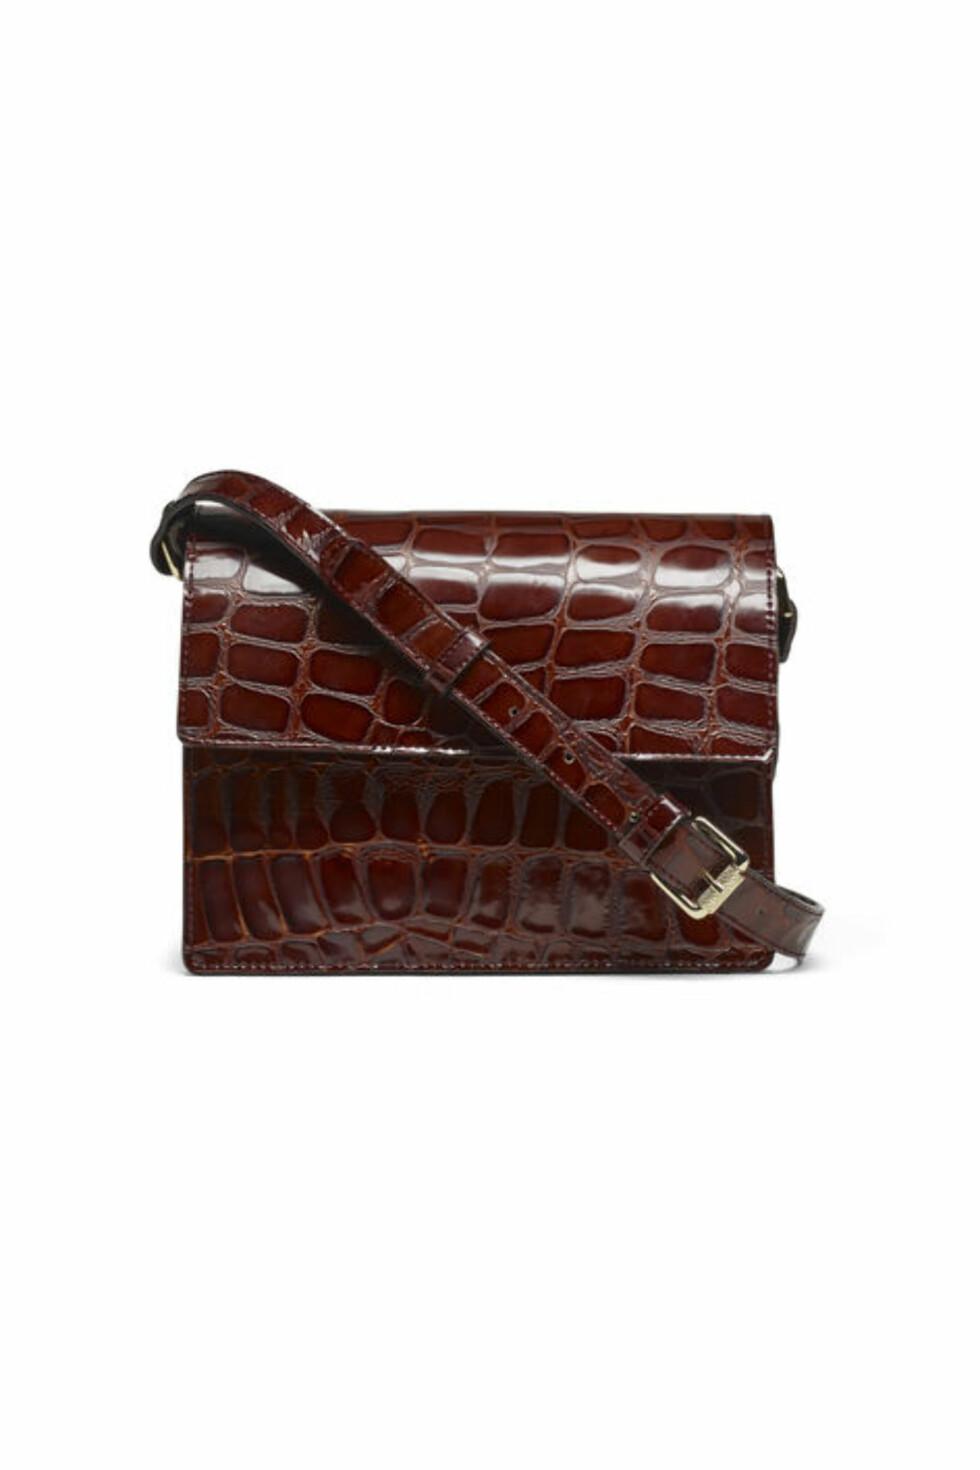 <strong>Veske fra Ganni | kr 3499 | http:</strong>//www.ganni.com/shop/bags/gallery-accessories-bag/A0977.html?dwvar_A0977_color=Soil%20Croco